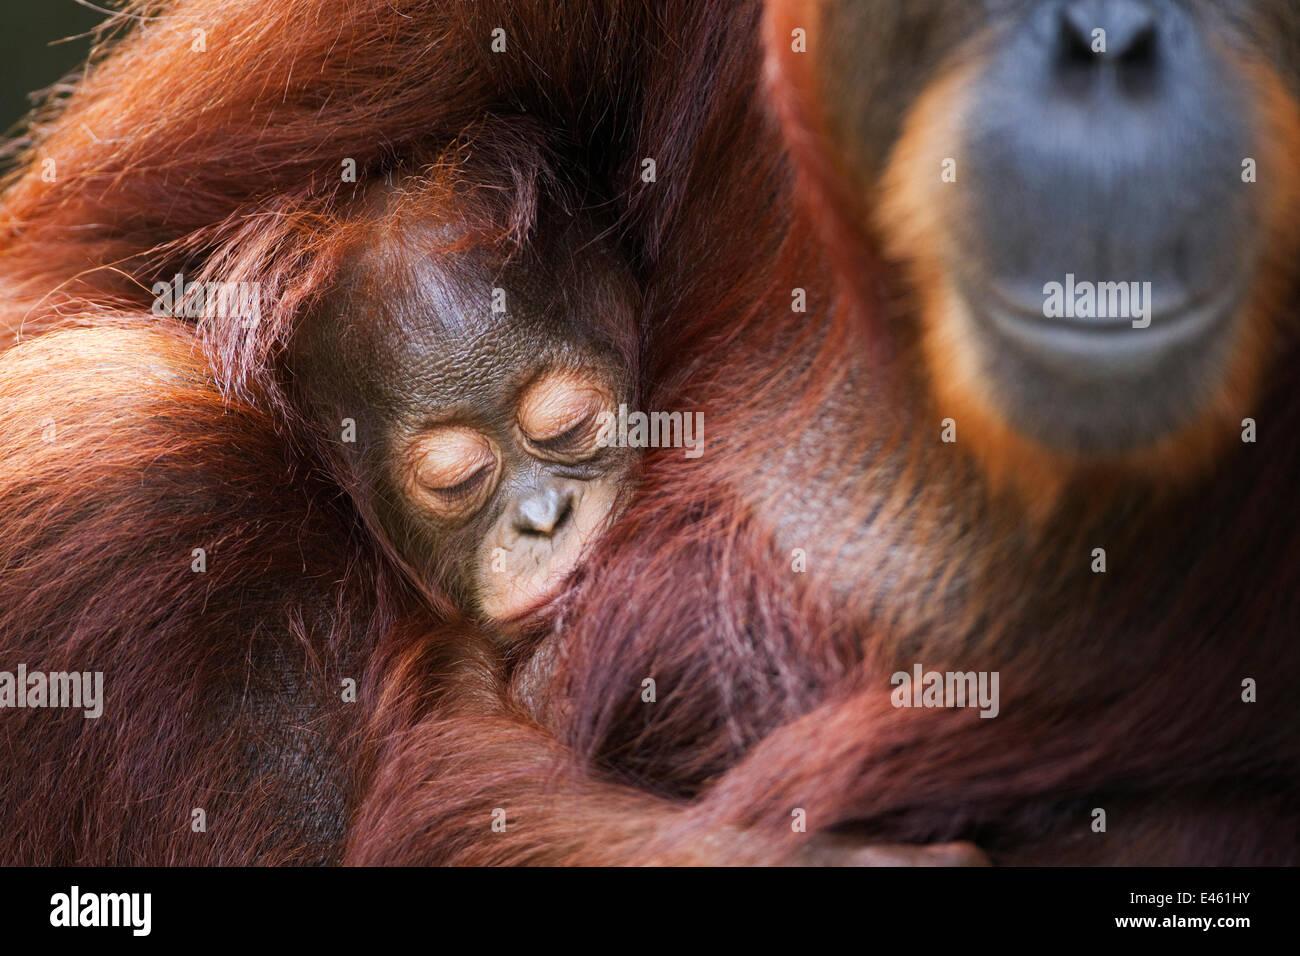 Bornean Orang-utan (Pongo pygmaeus wurmbii) female 'Tutut' cradling her sleeping baby 'Thor' aged - Stock Image